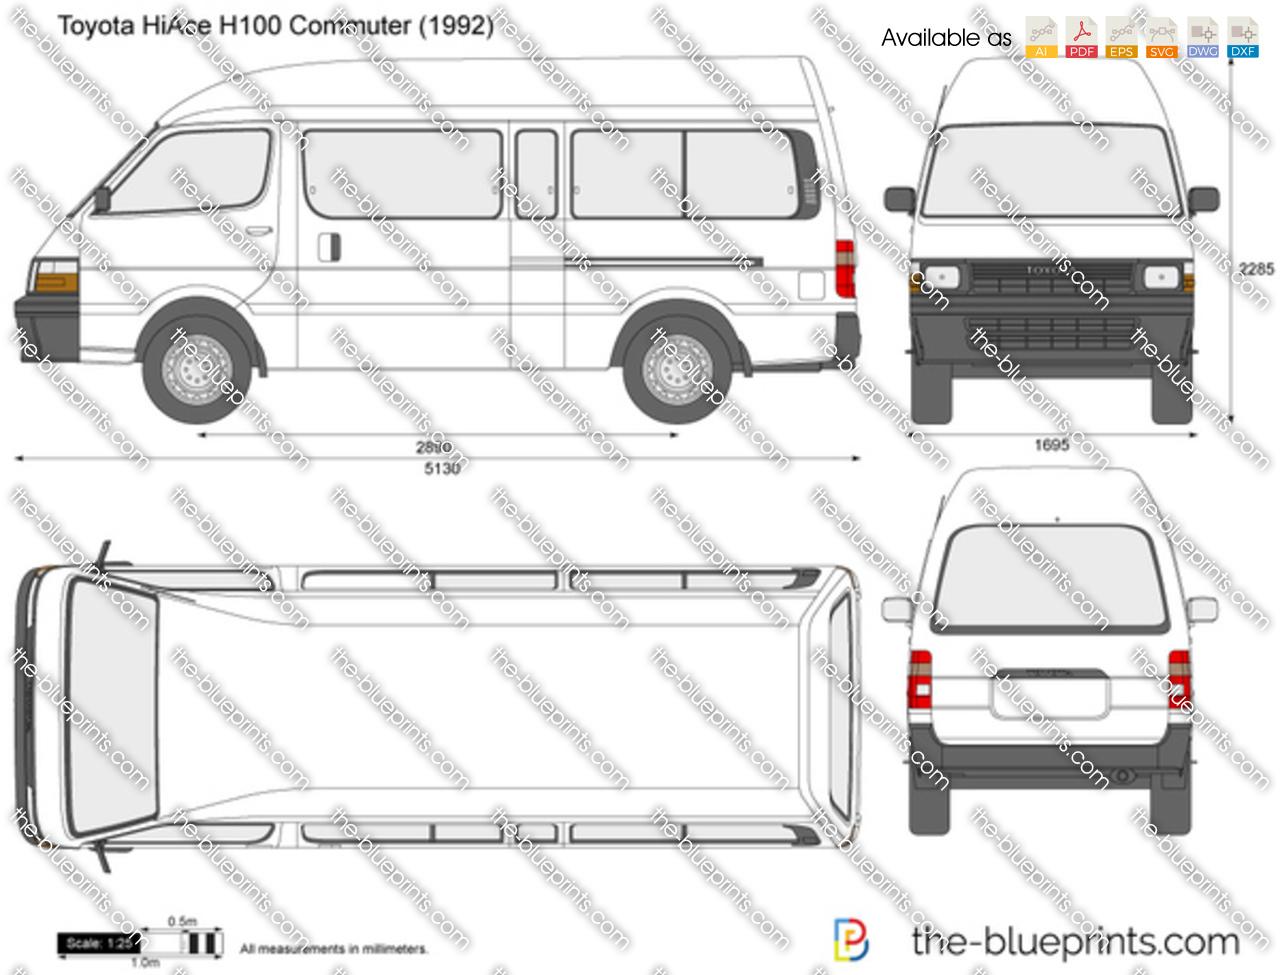 Toyota HiAce H100 Commuter 2014